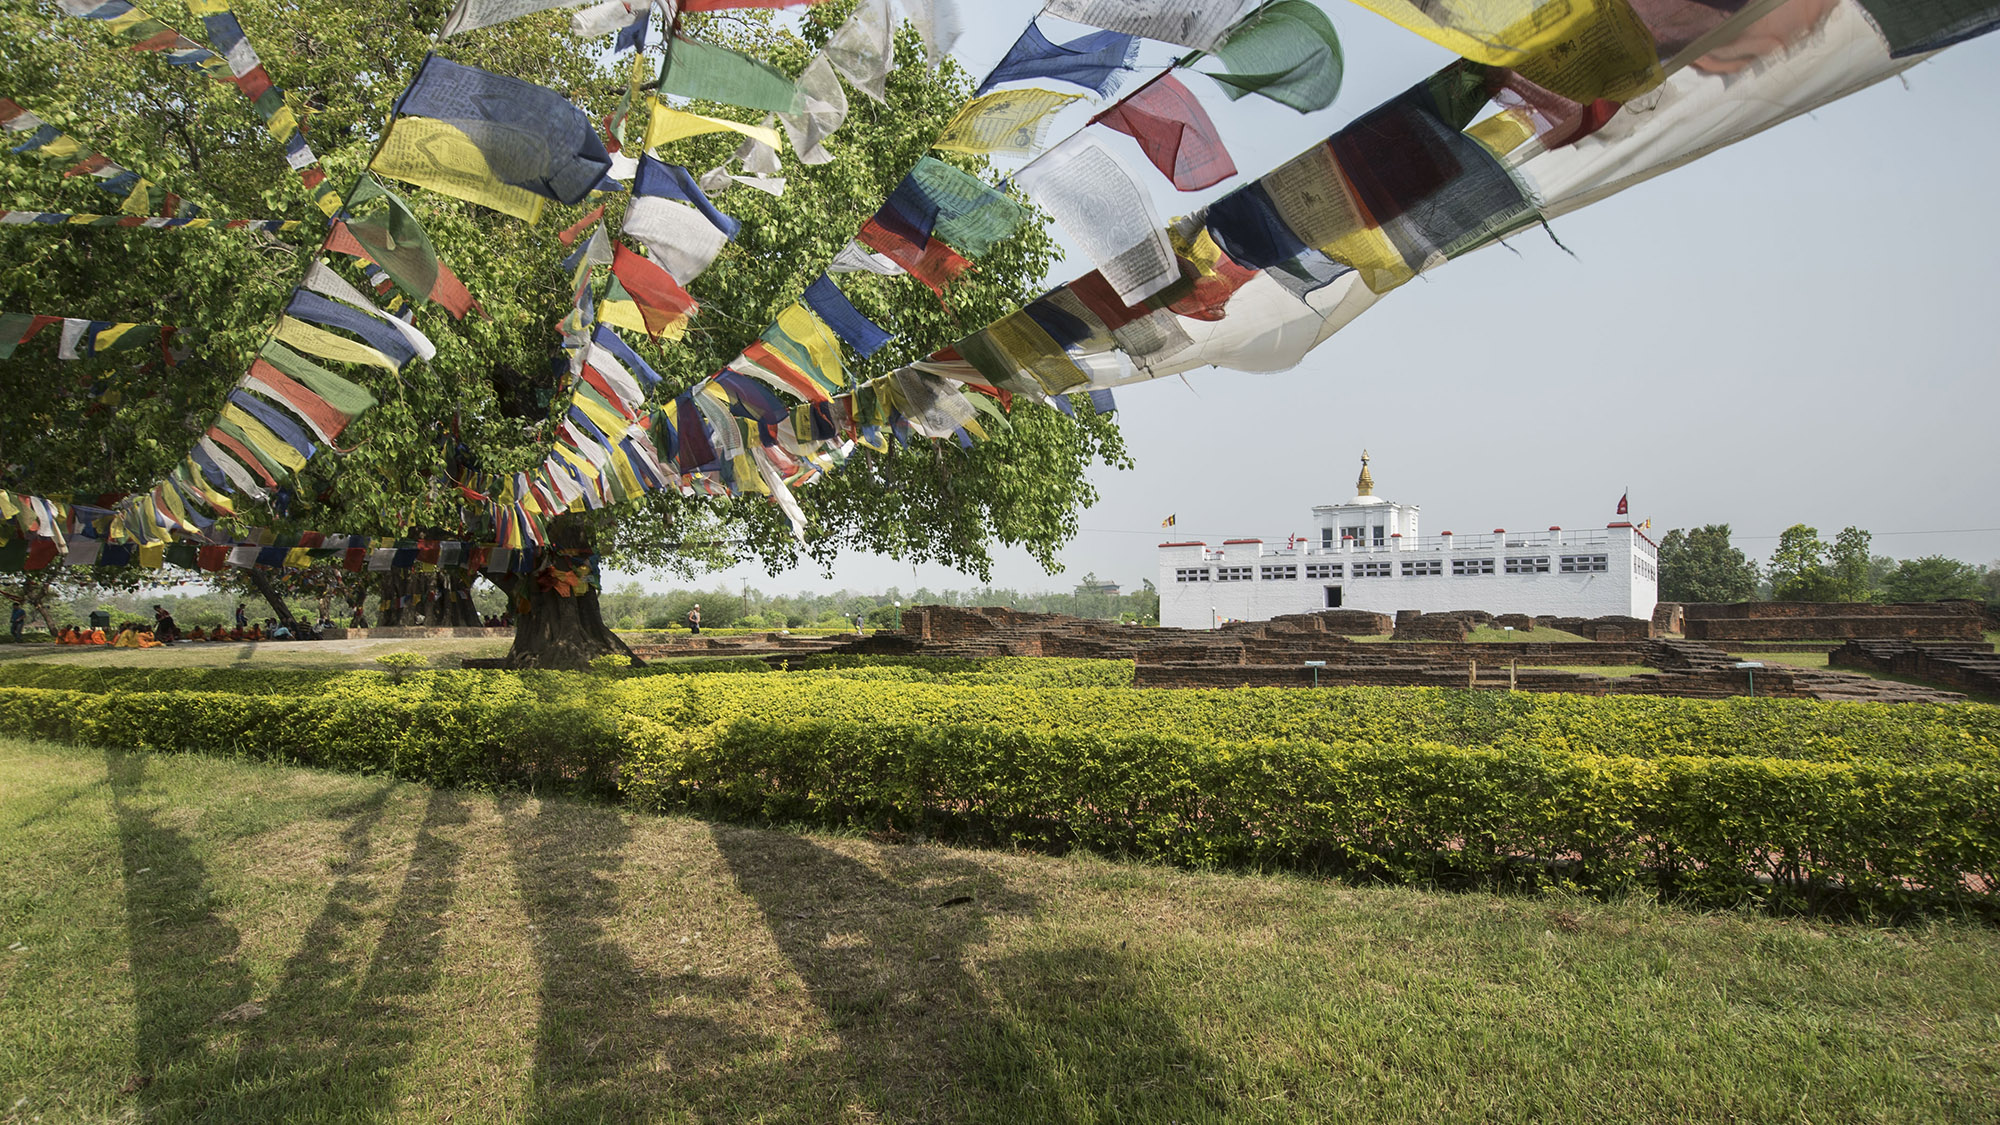 The Maya Devi Temple, the exact location where Princes Maya Devi gave birth to the Buddha, Siddartha Gautama. Lumbini, Nepal.